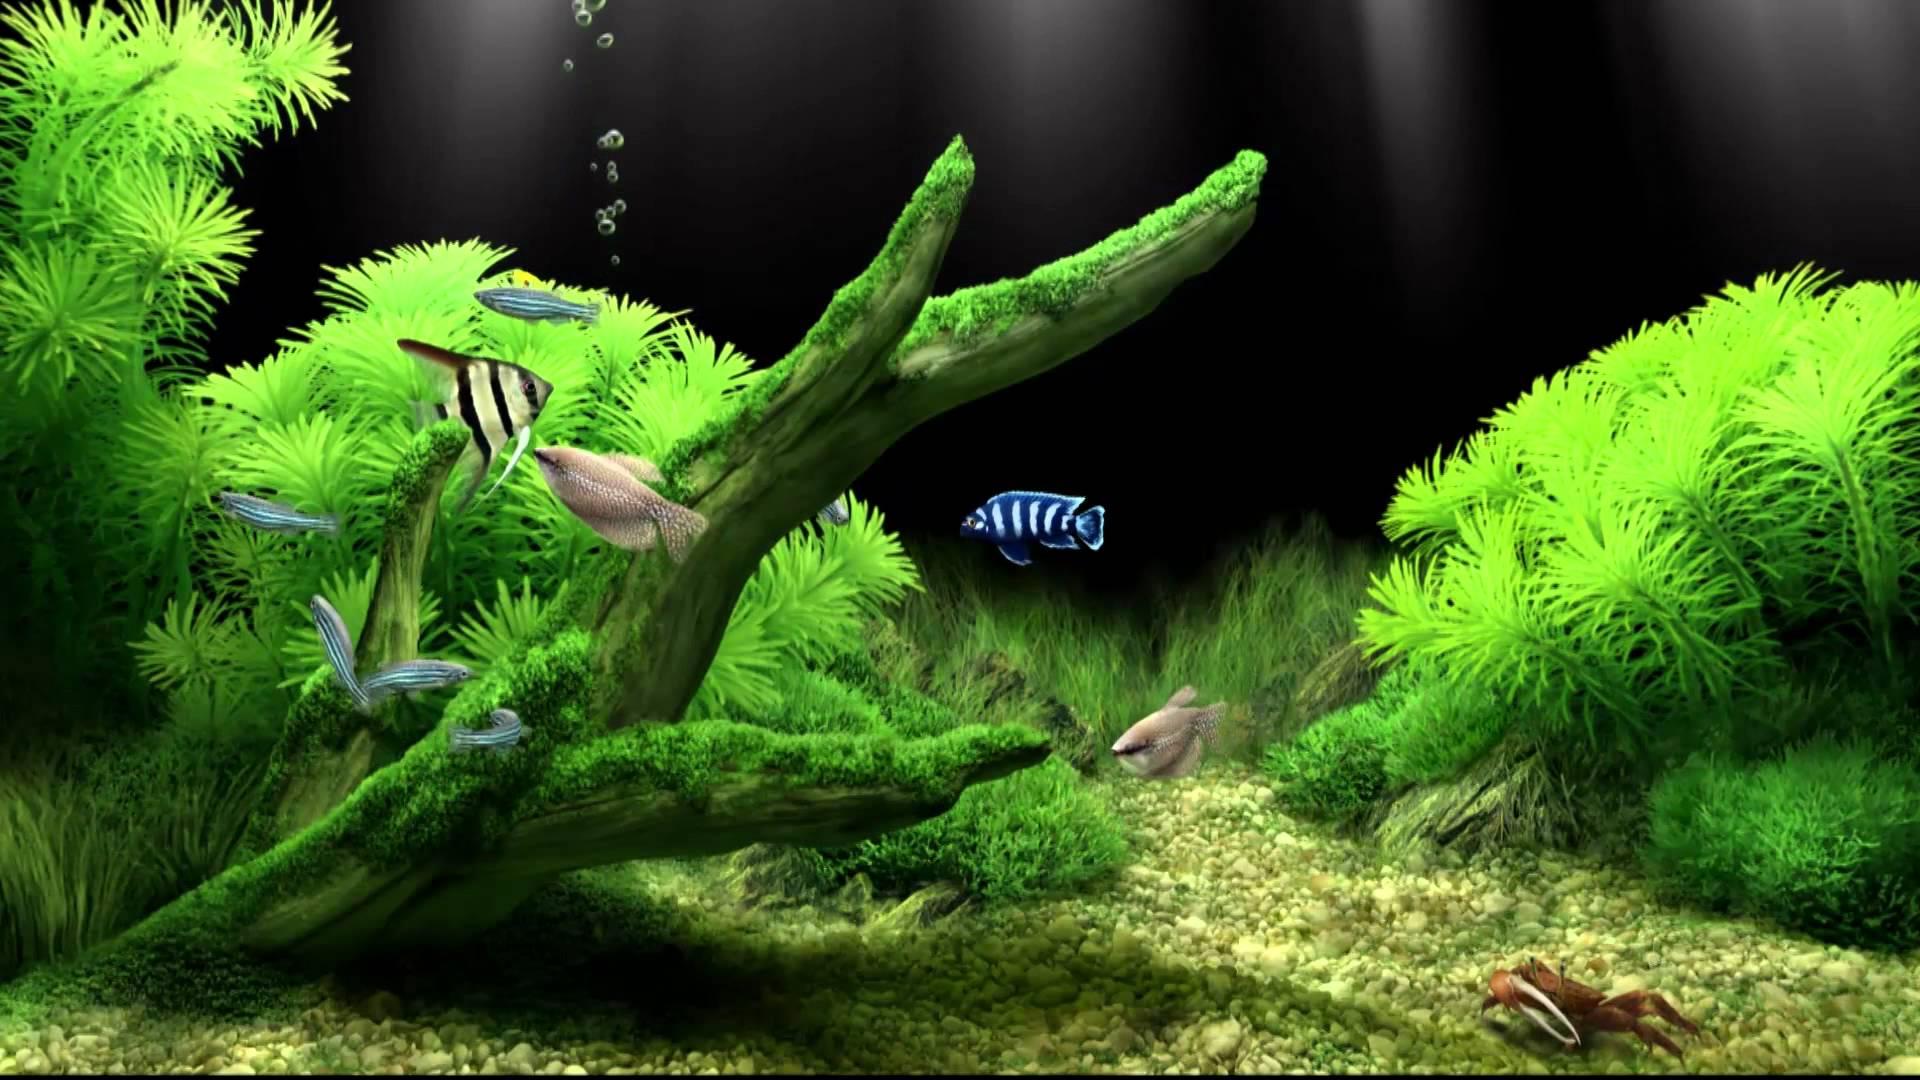 Koi Fish 3d Animated Wallpaper Poisson Fond D 233 Cran Hd Arri 232 Re Plan 1920x1080 Id